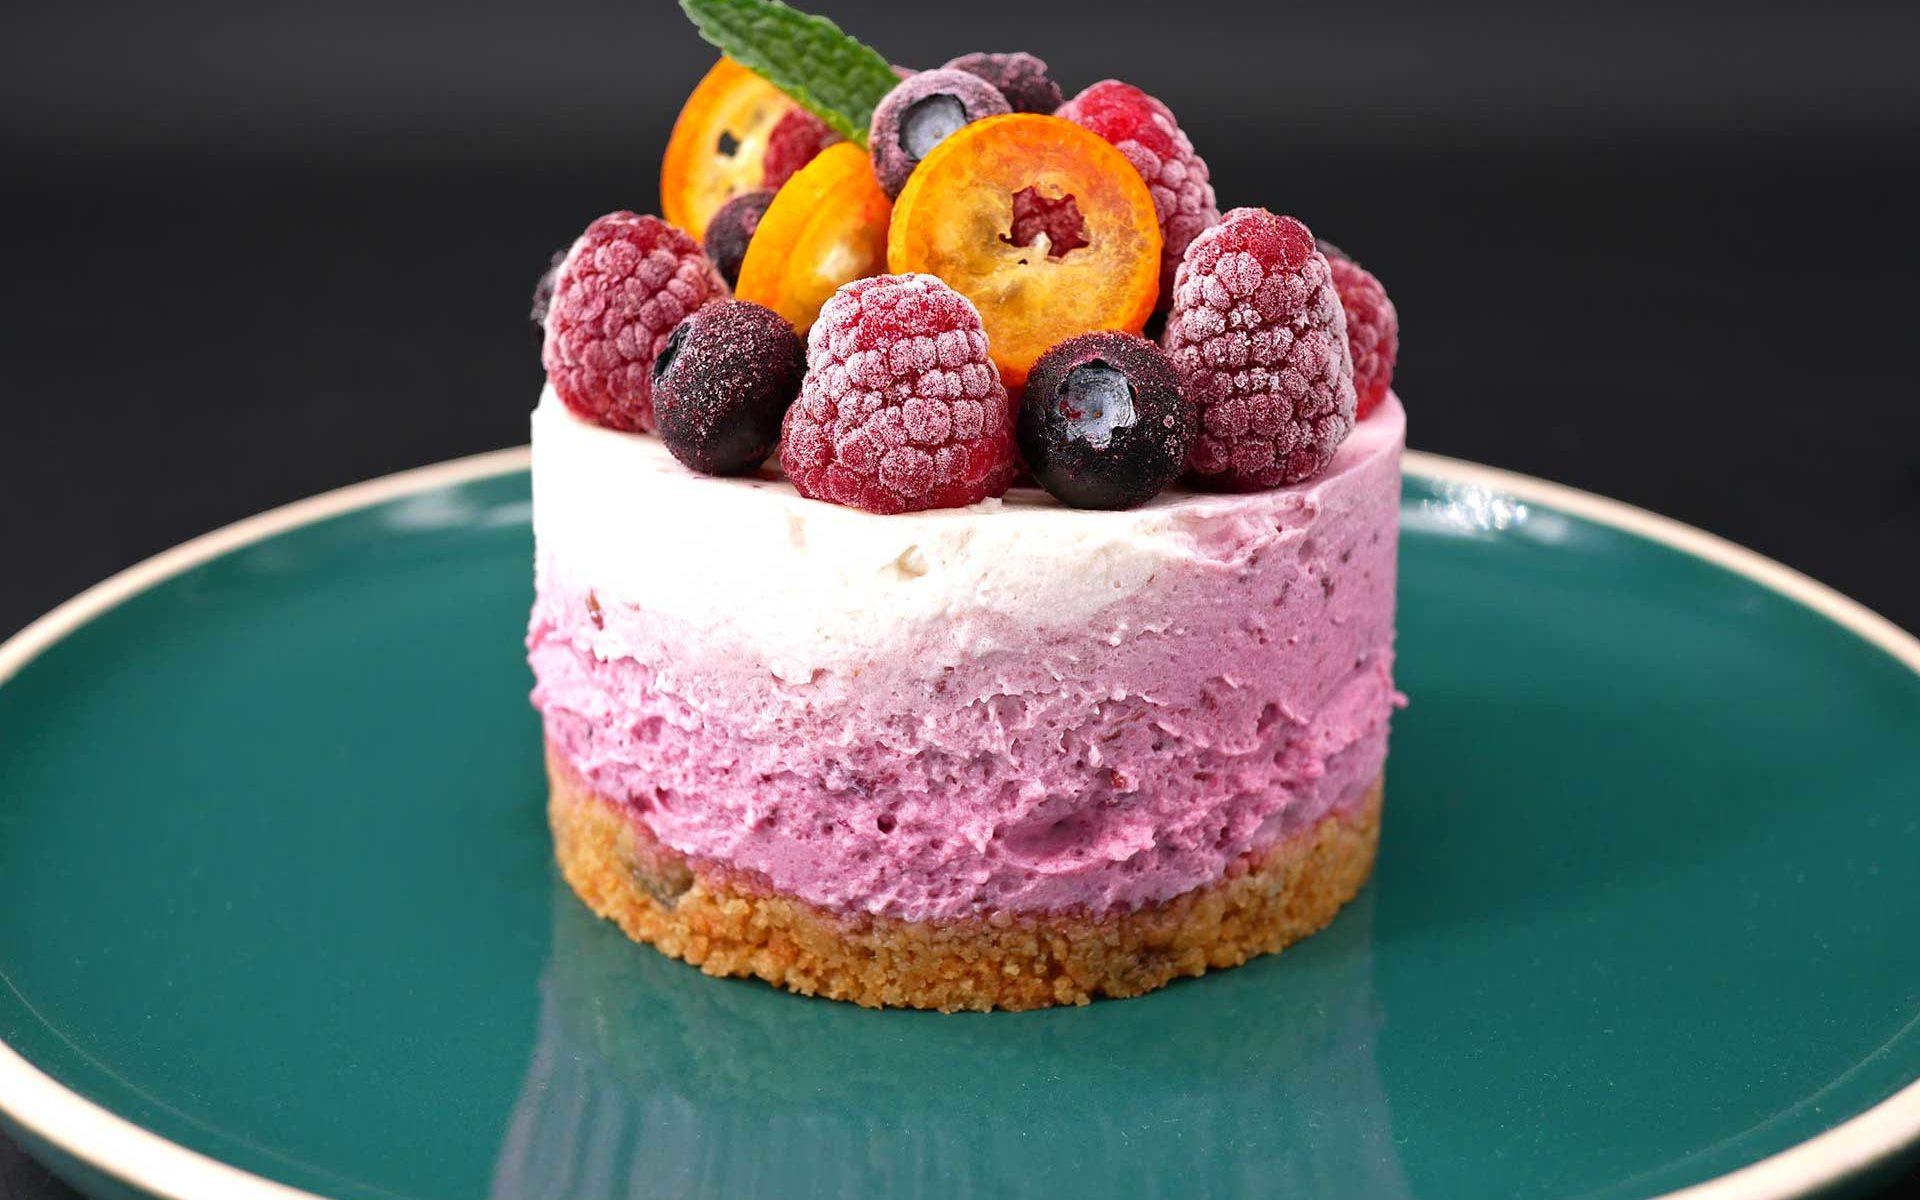 Cheesecake marbré aux fruits rouges